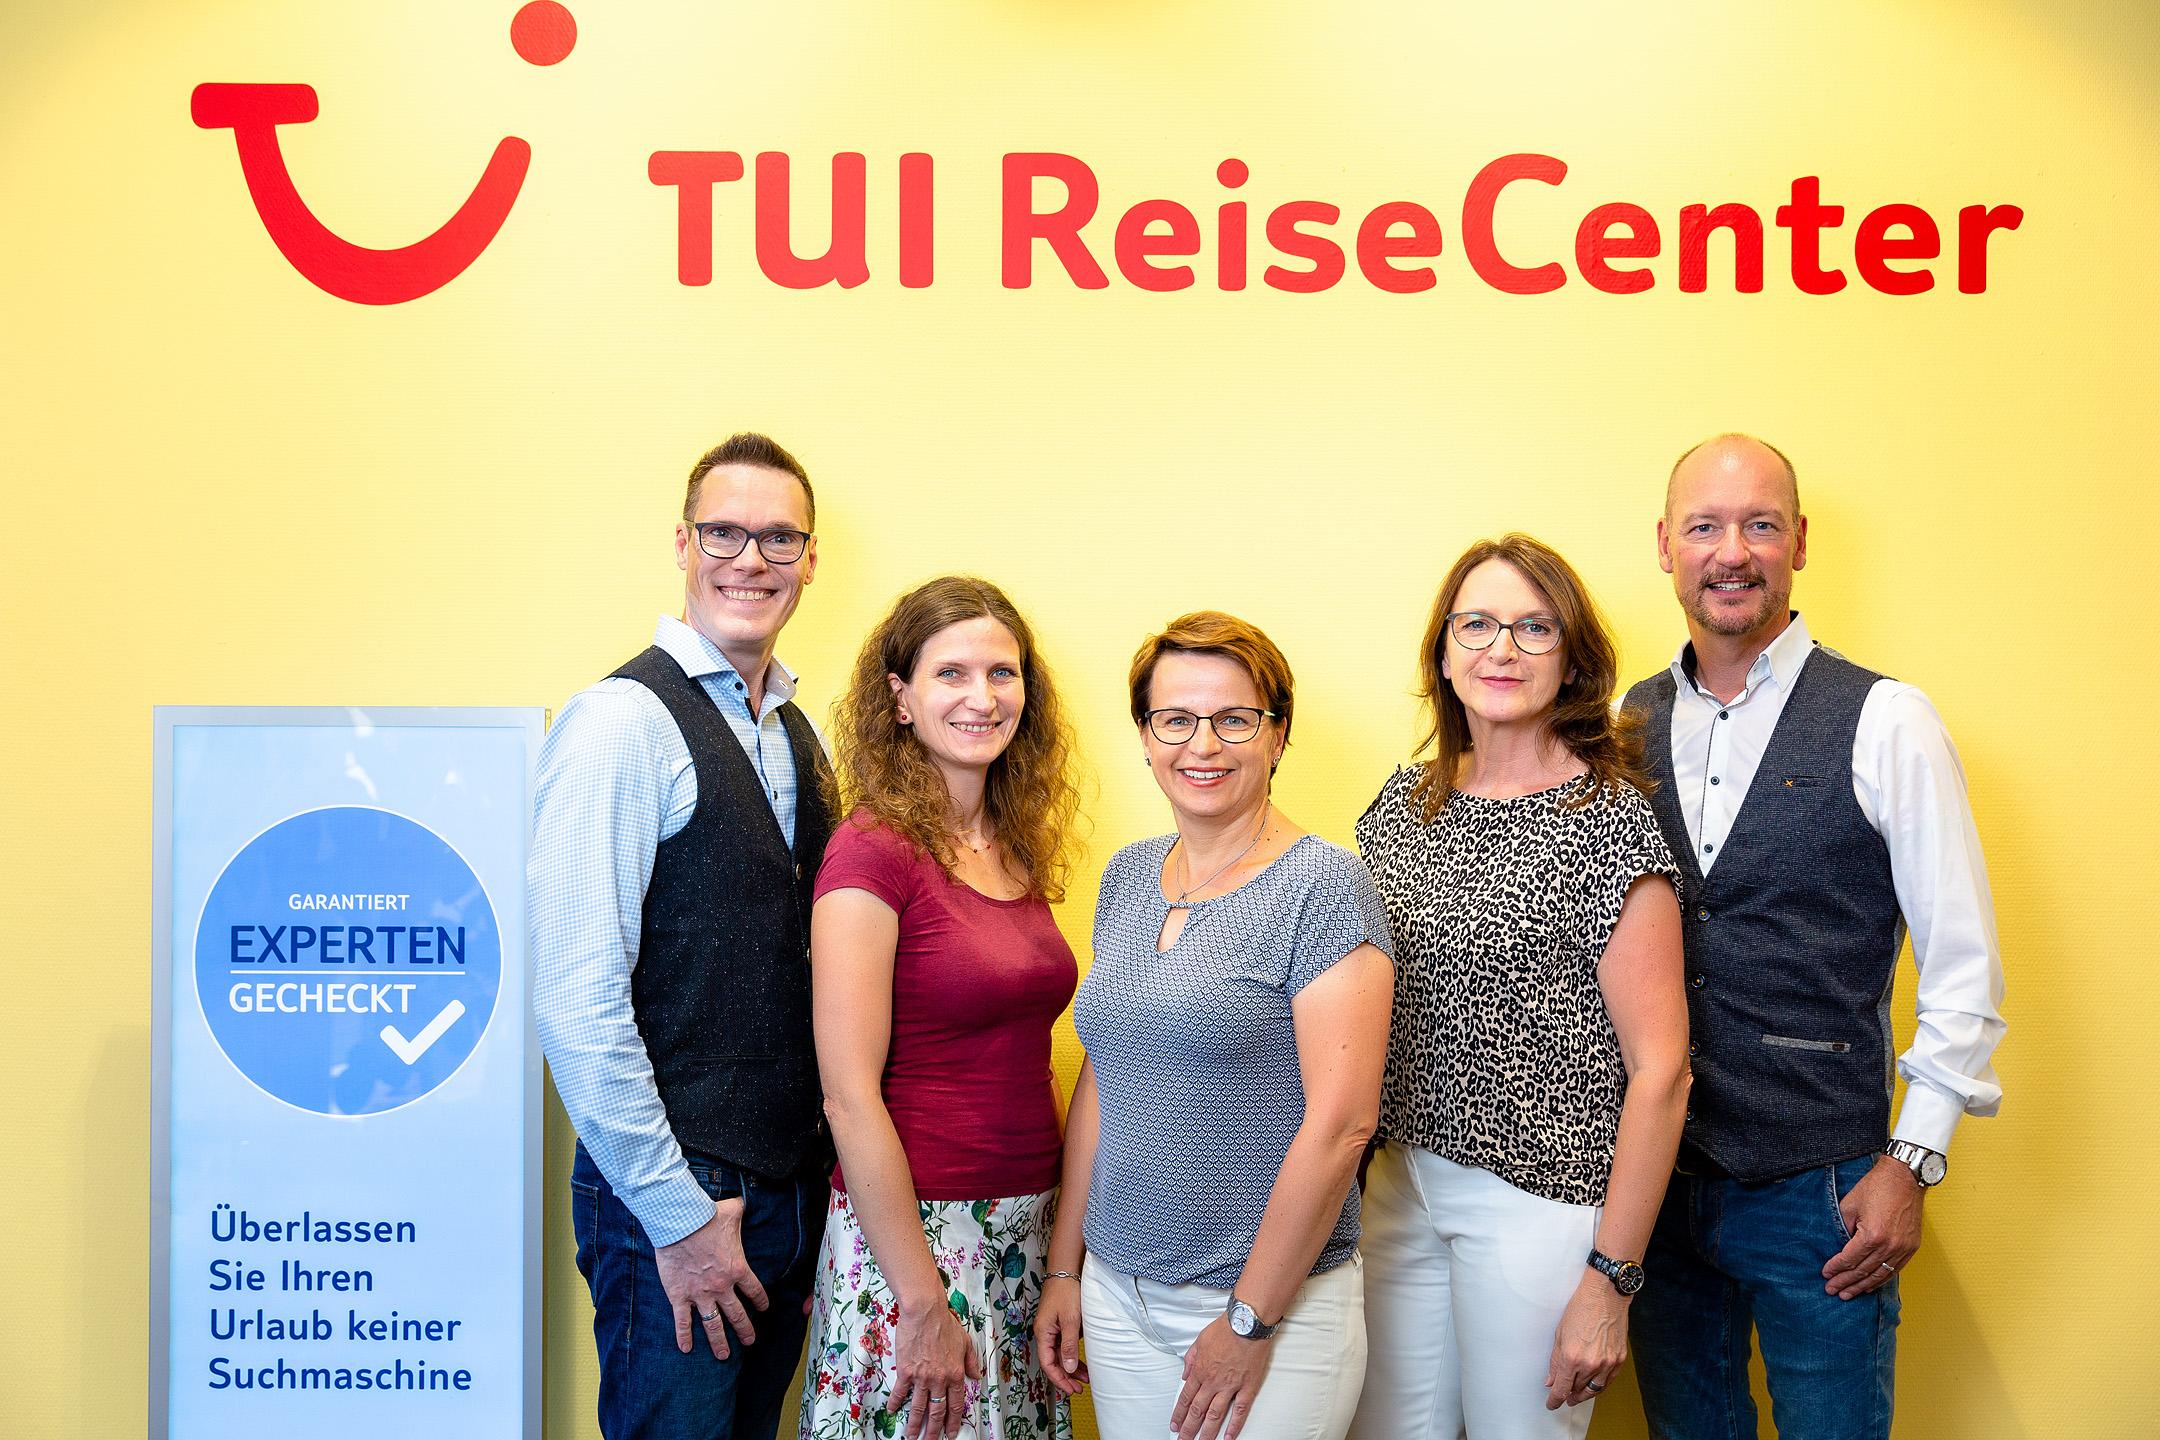 TUI ReiseCenter, Hüblerstr. in Dresden